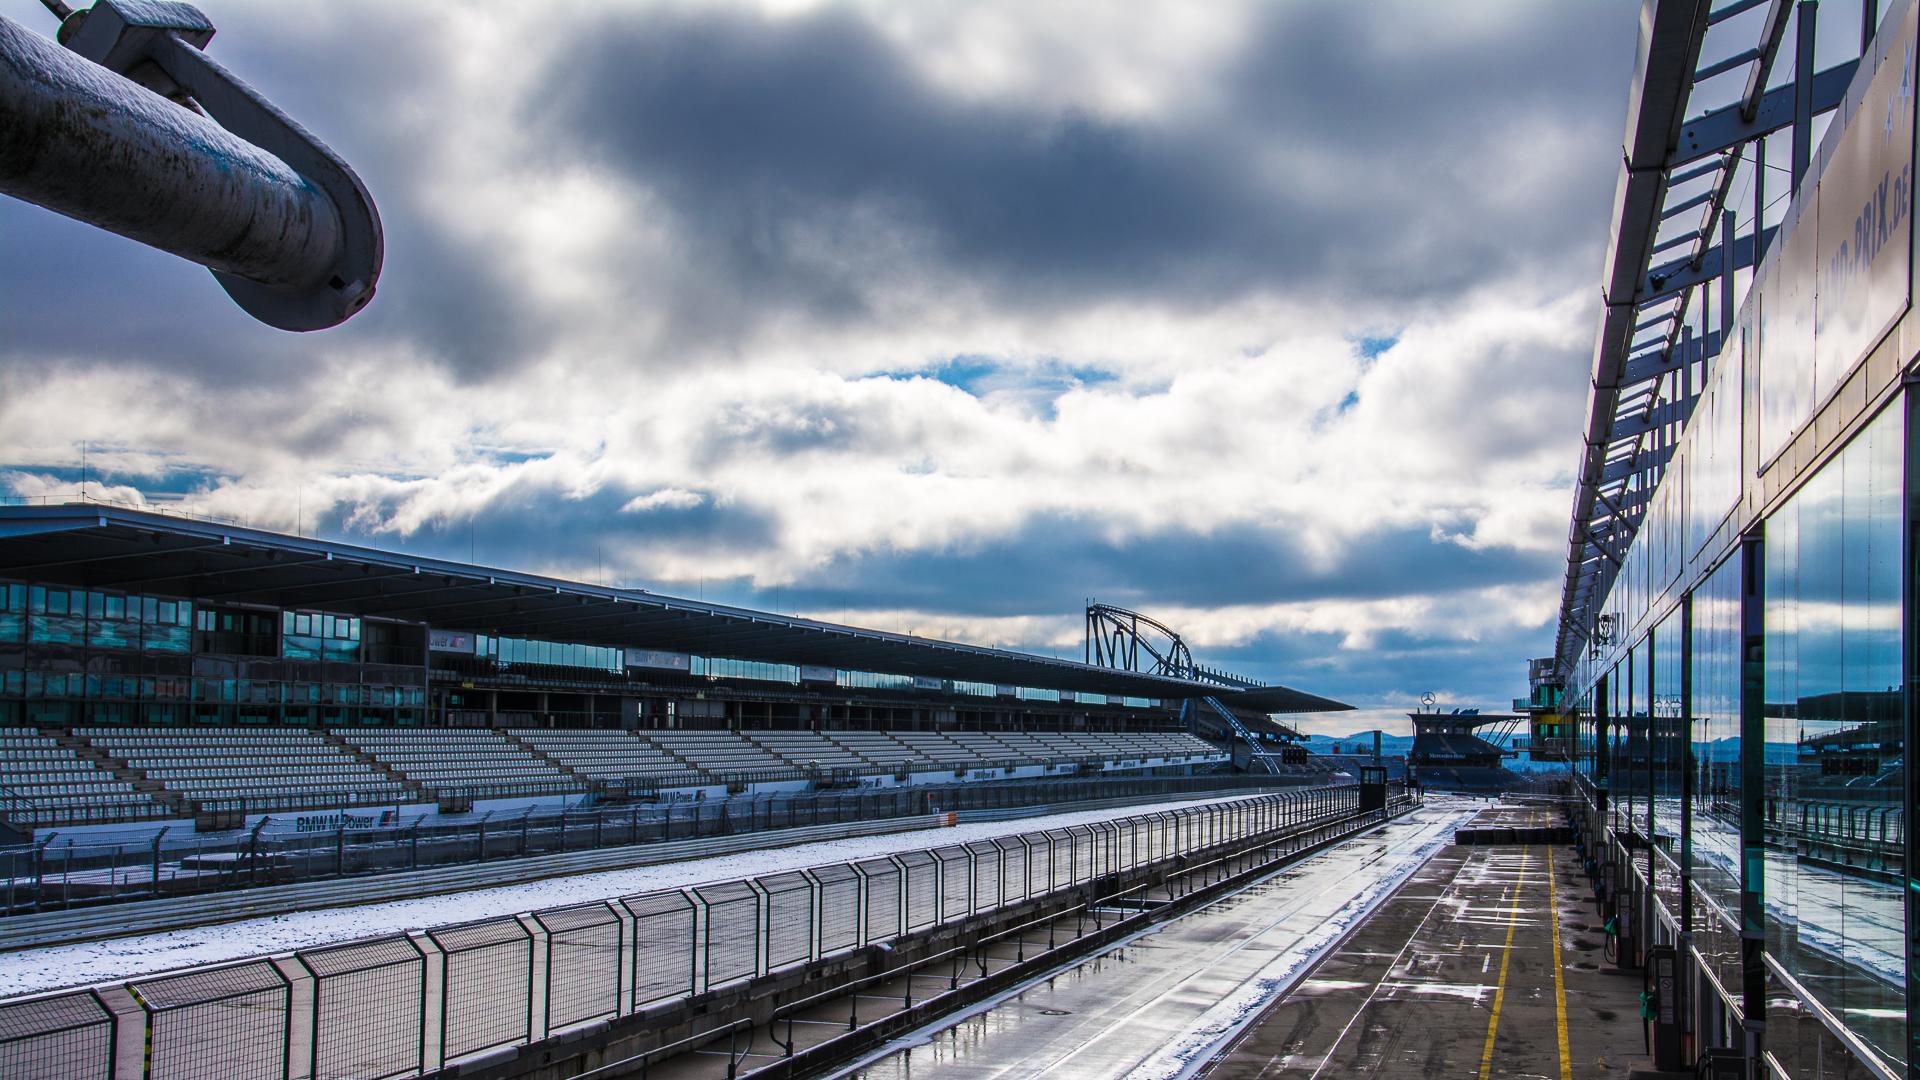 Nürburgring Start-finish Straight, Germany